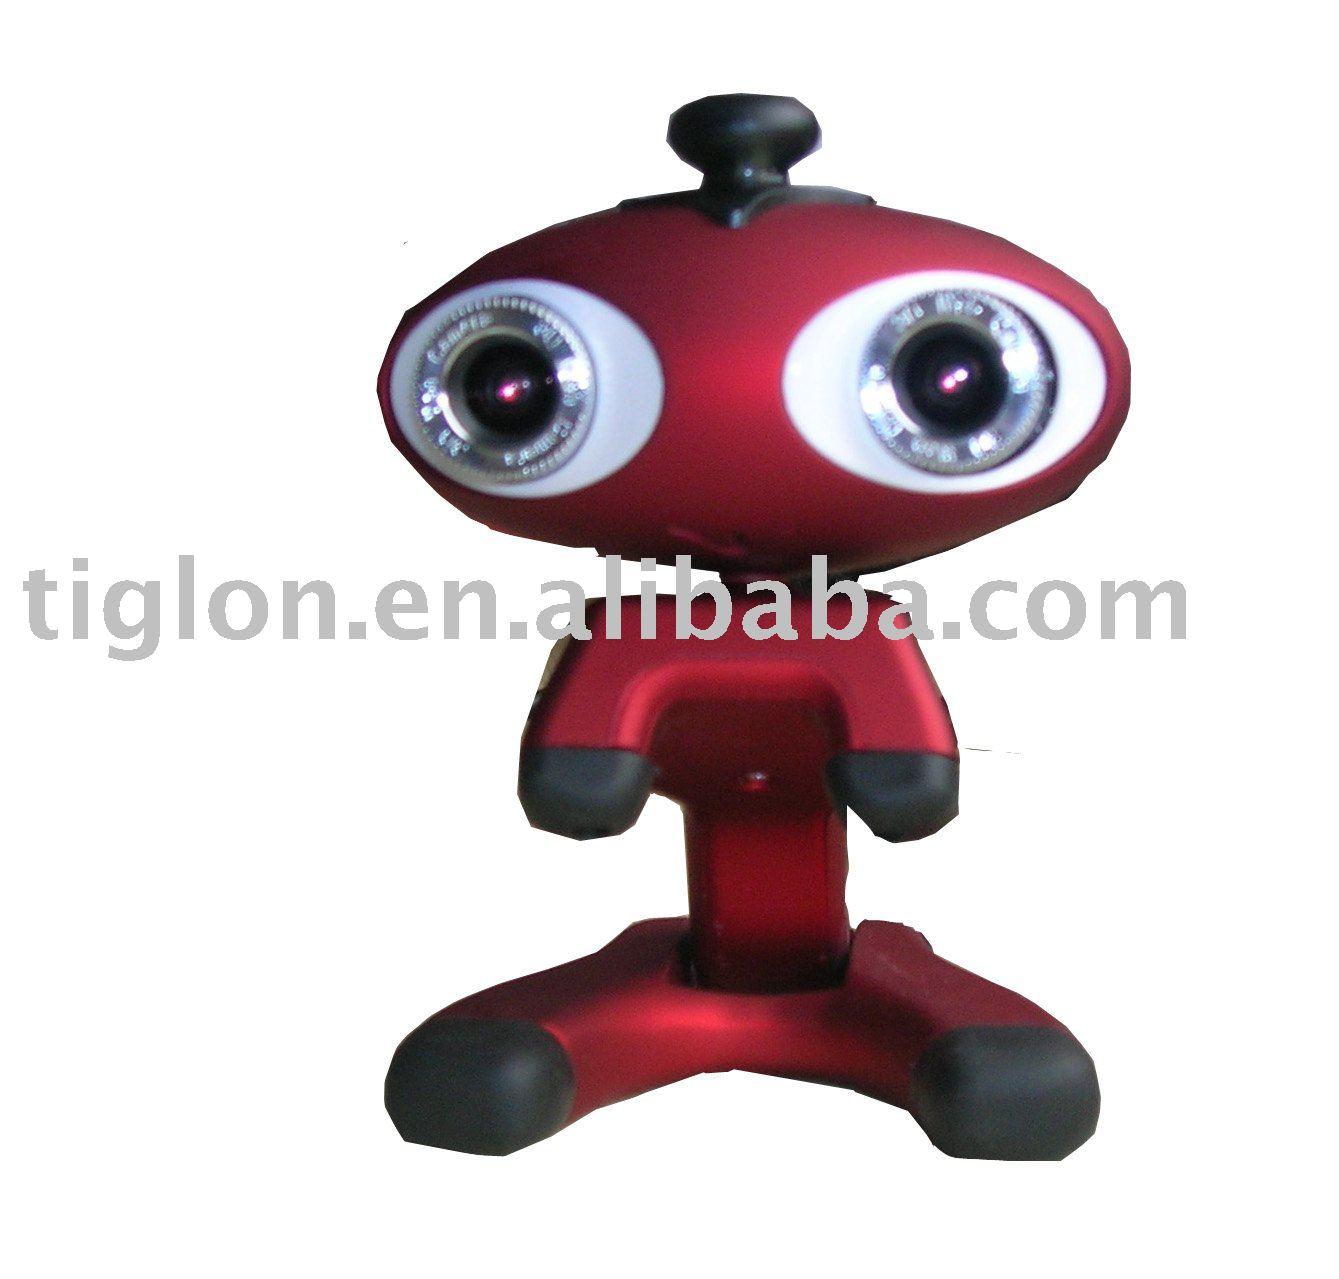 vg o webcam sexchat